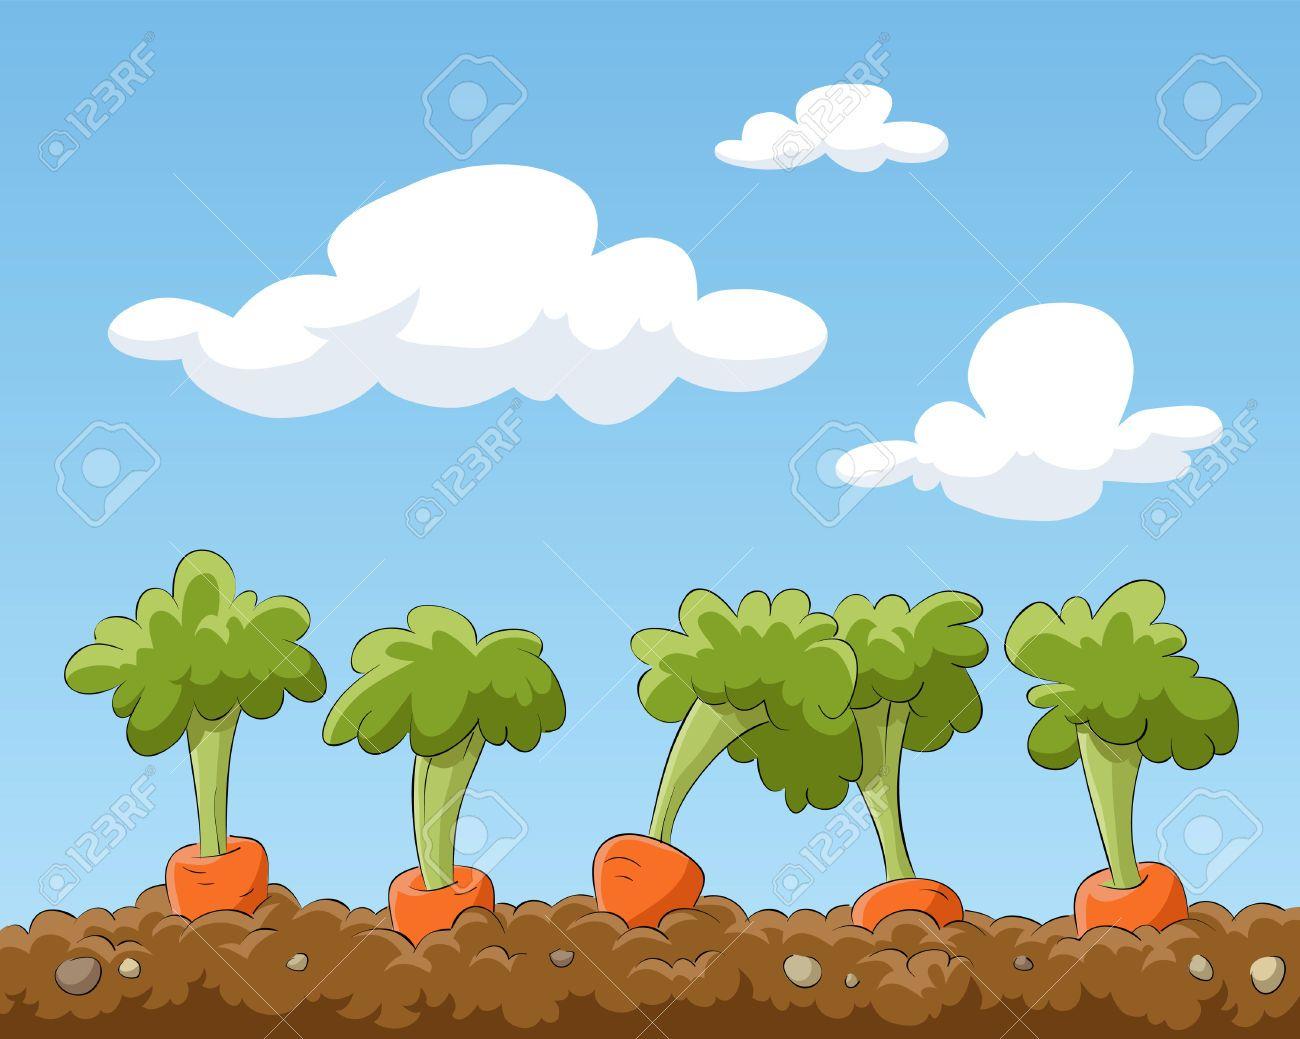 Vegetable field clipart vector royalty free Pin by simon dewey on inspiration | Cartoon garden, Garden ... vector royalty free